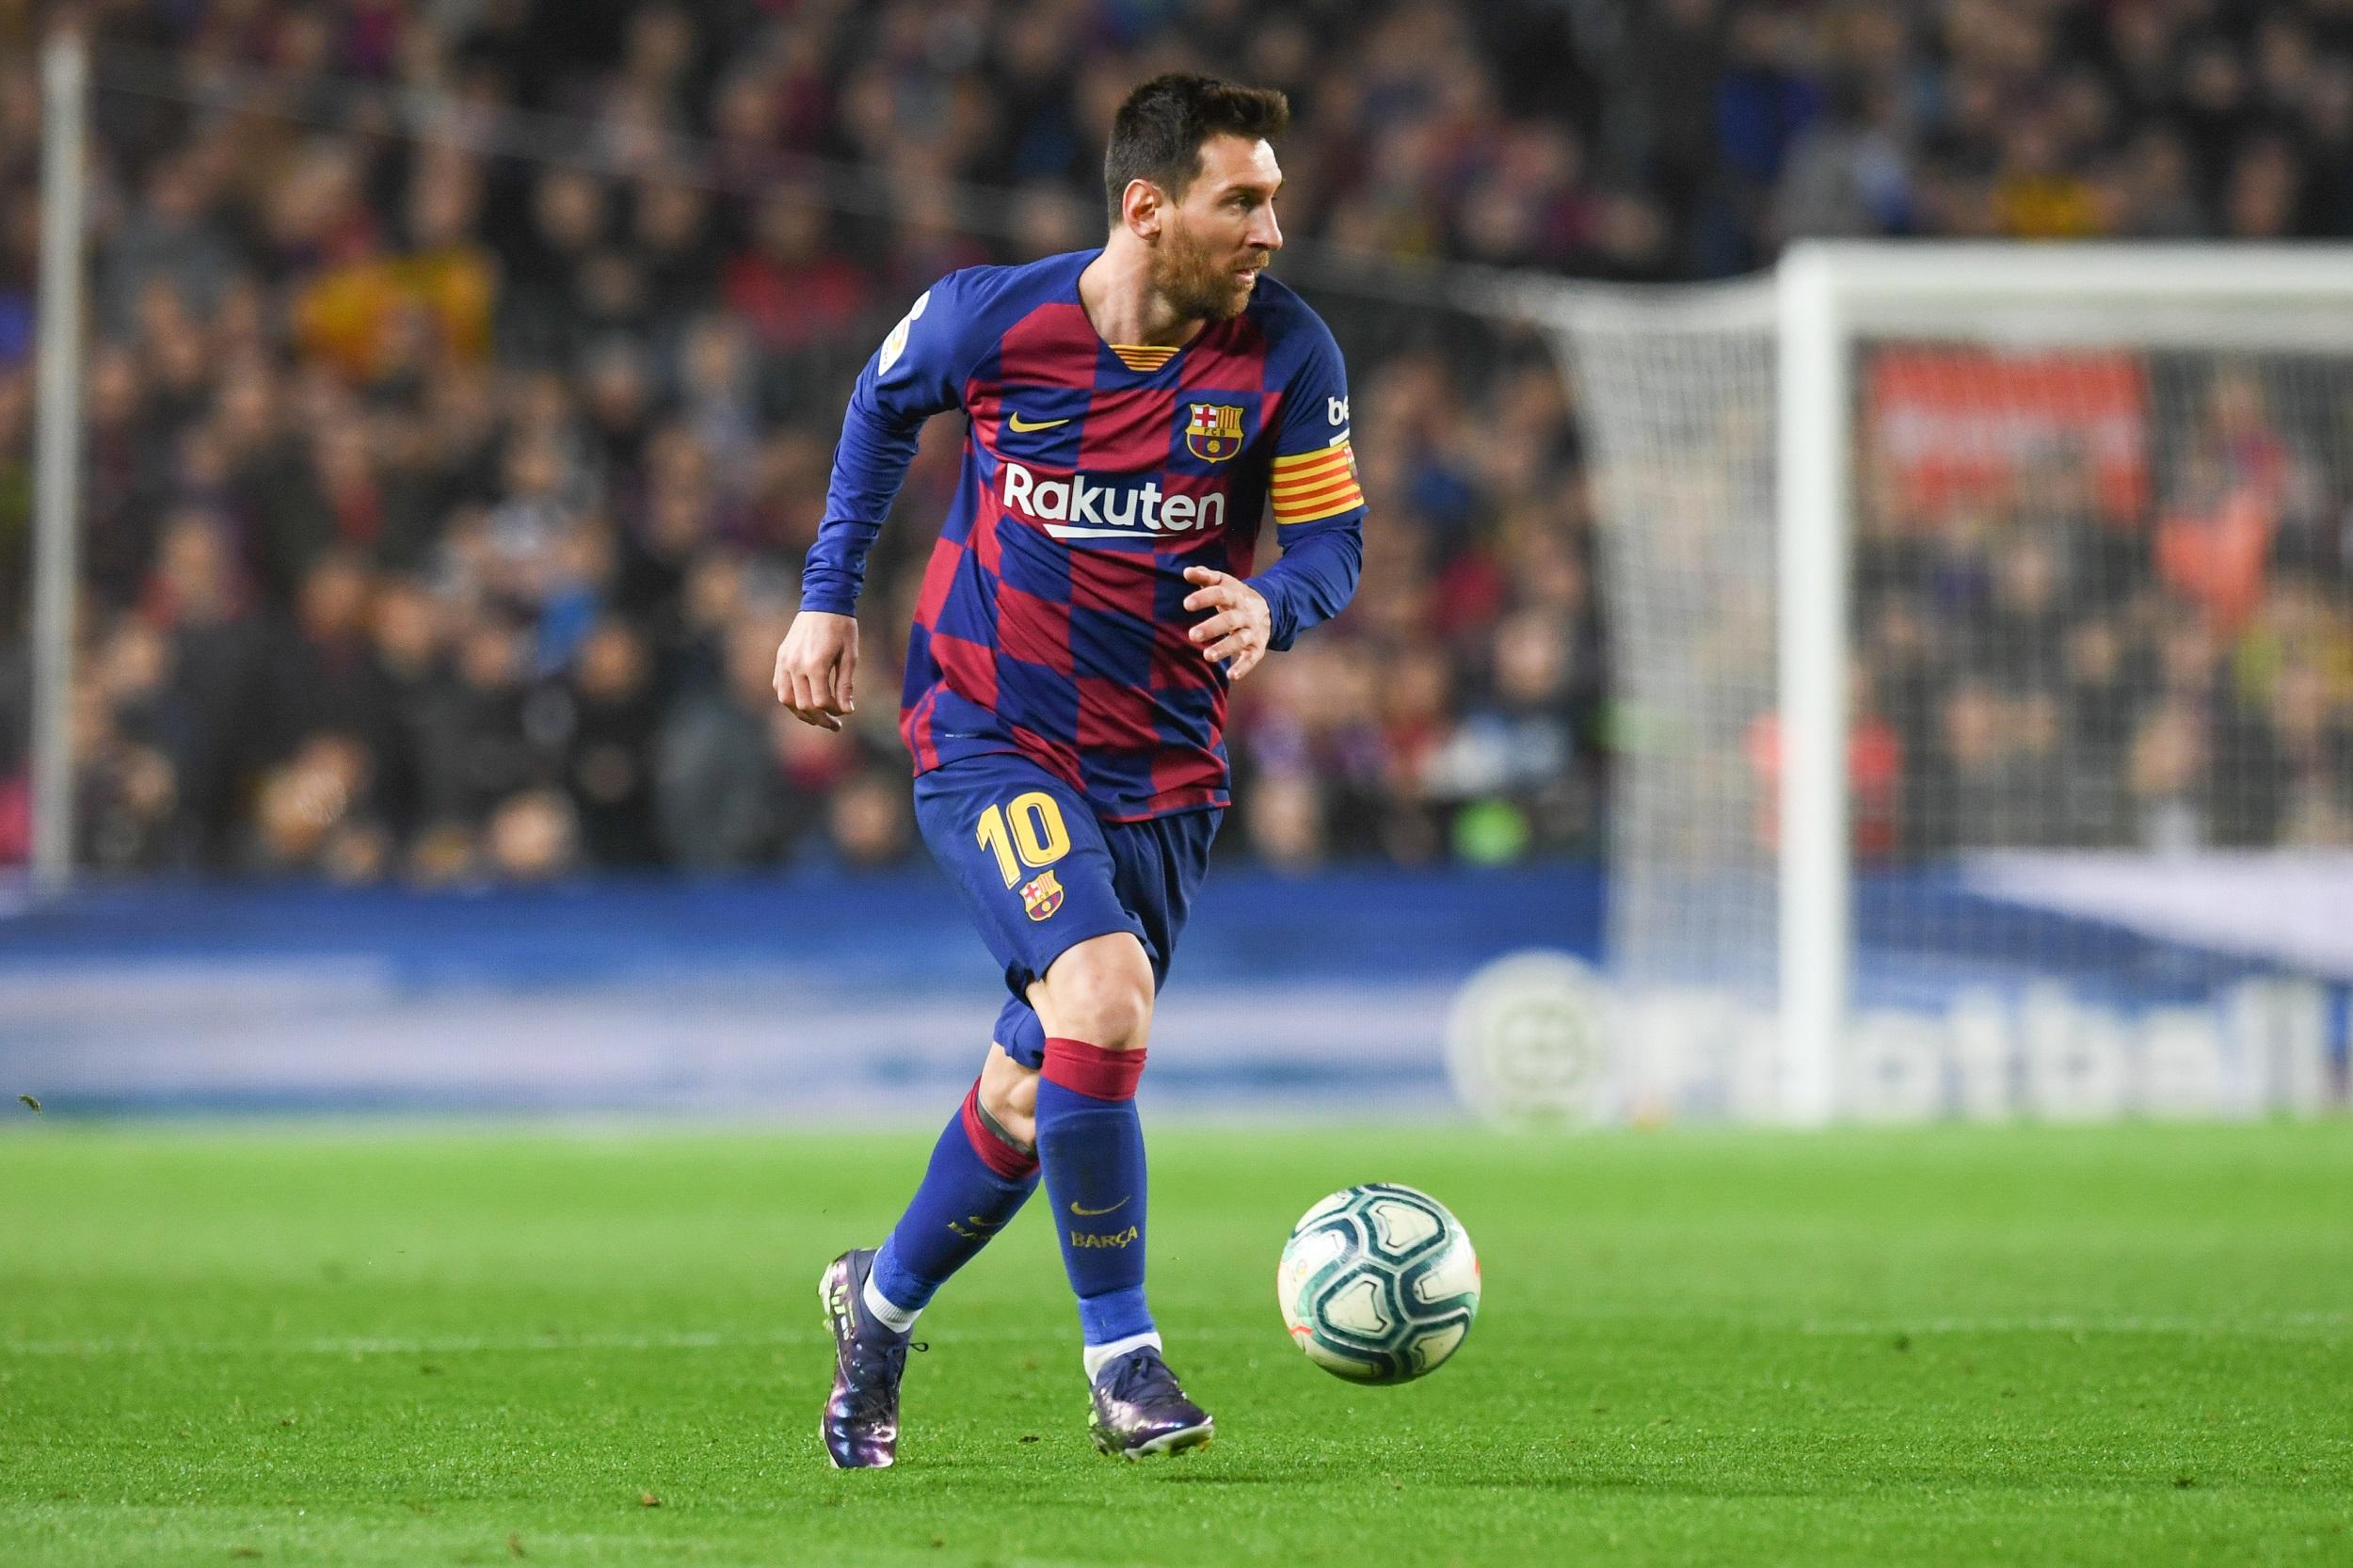 Football - Transferts - Journal du mercato: Le Barça veut prolonger Messi, Camavinga supervisé par le Real